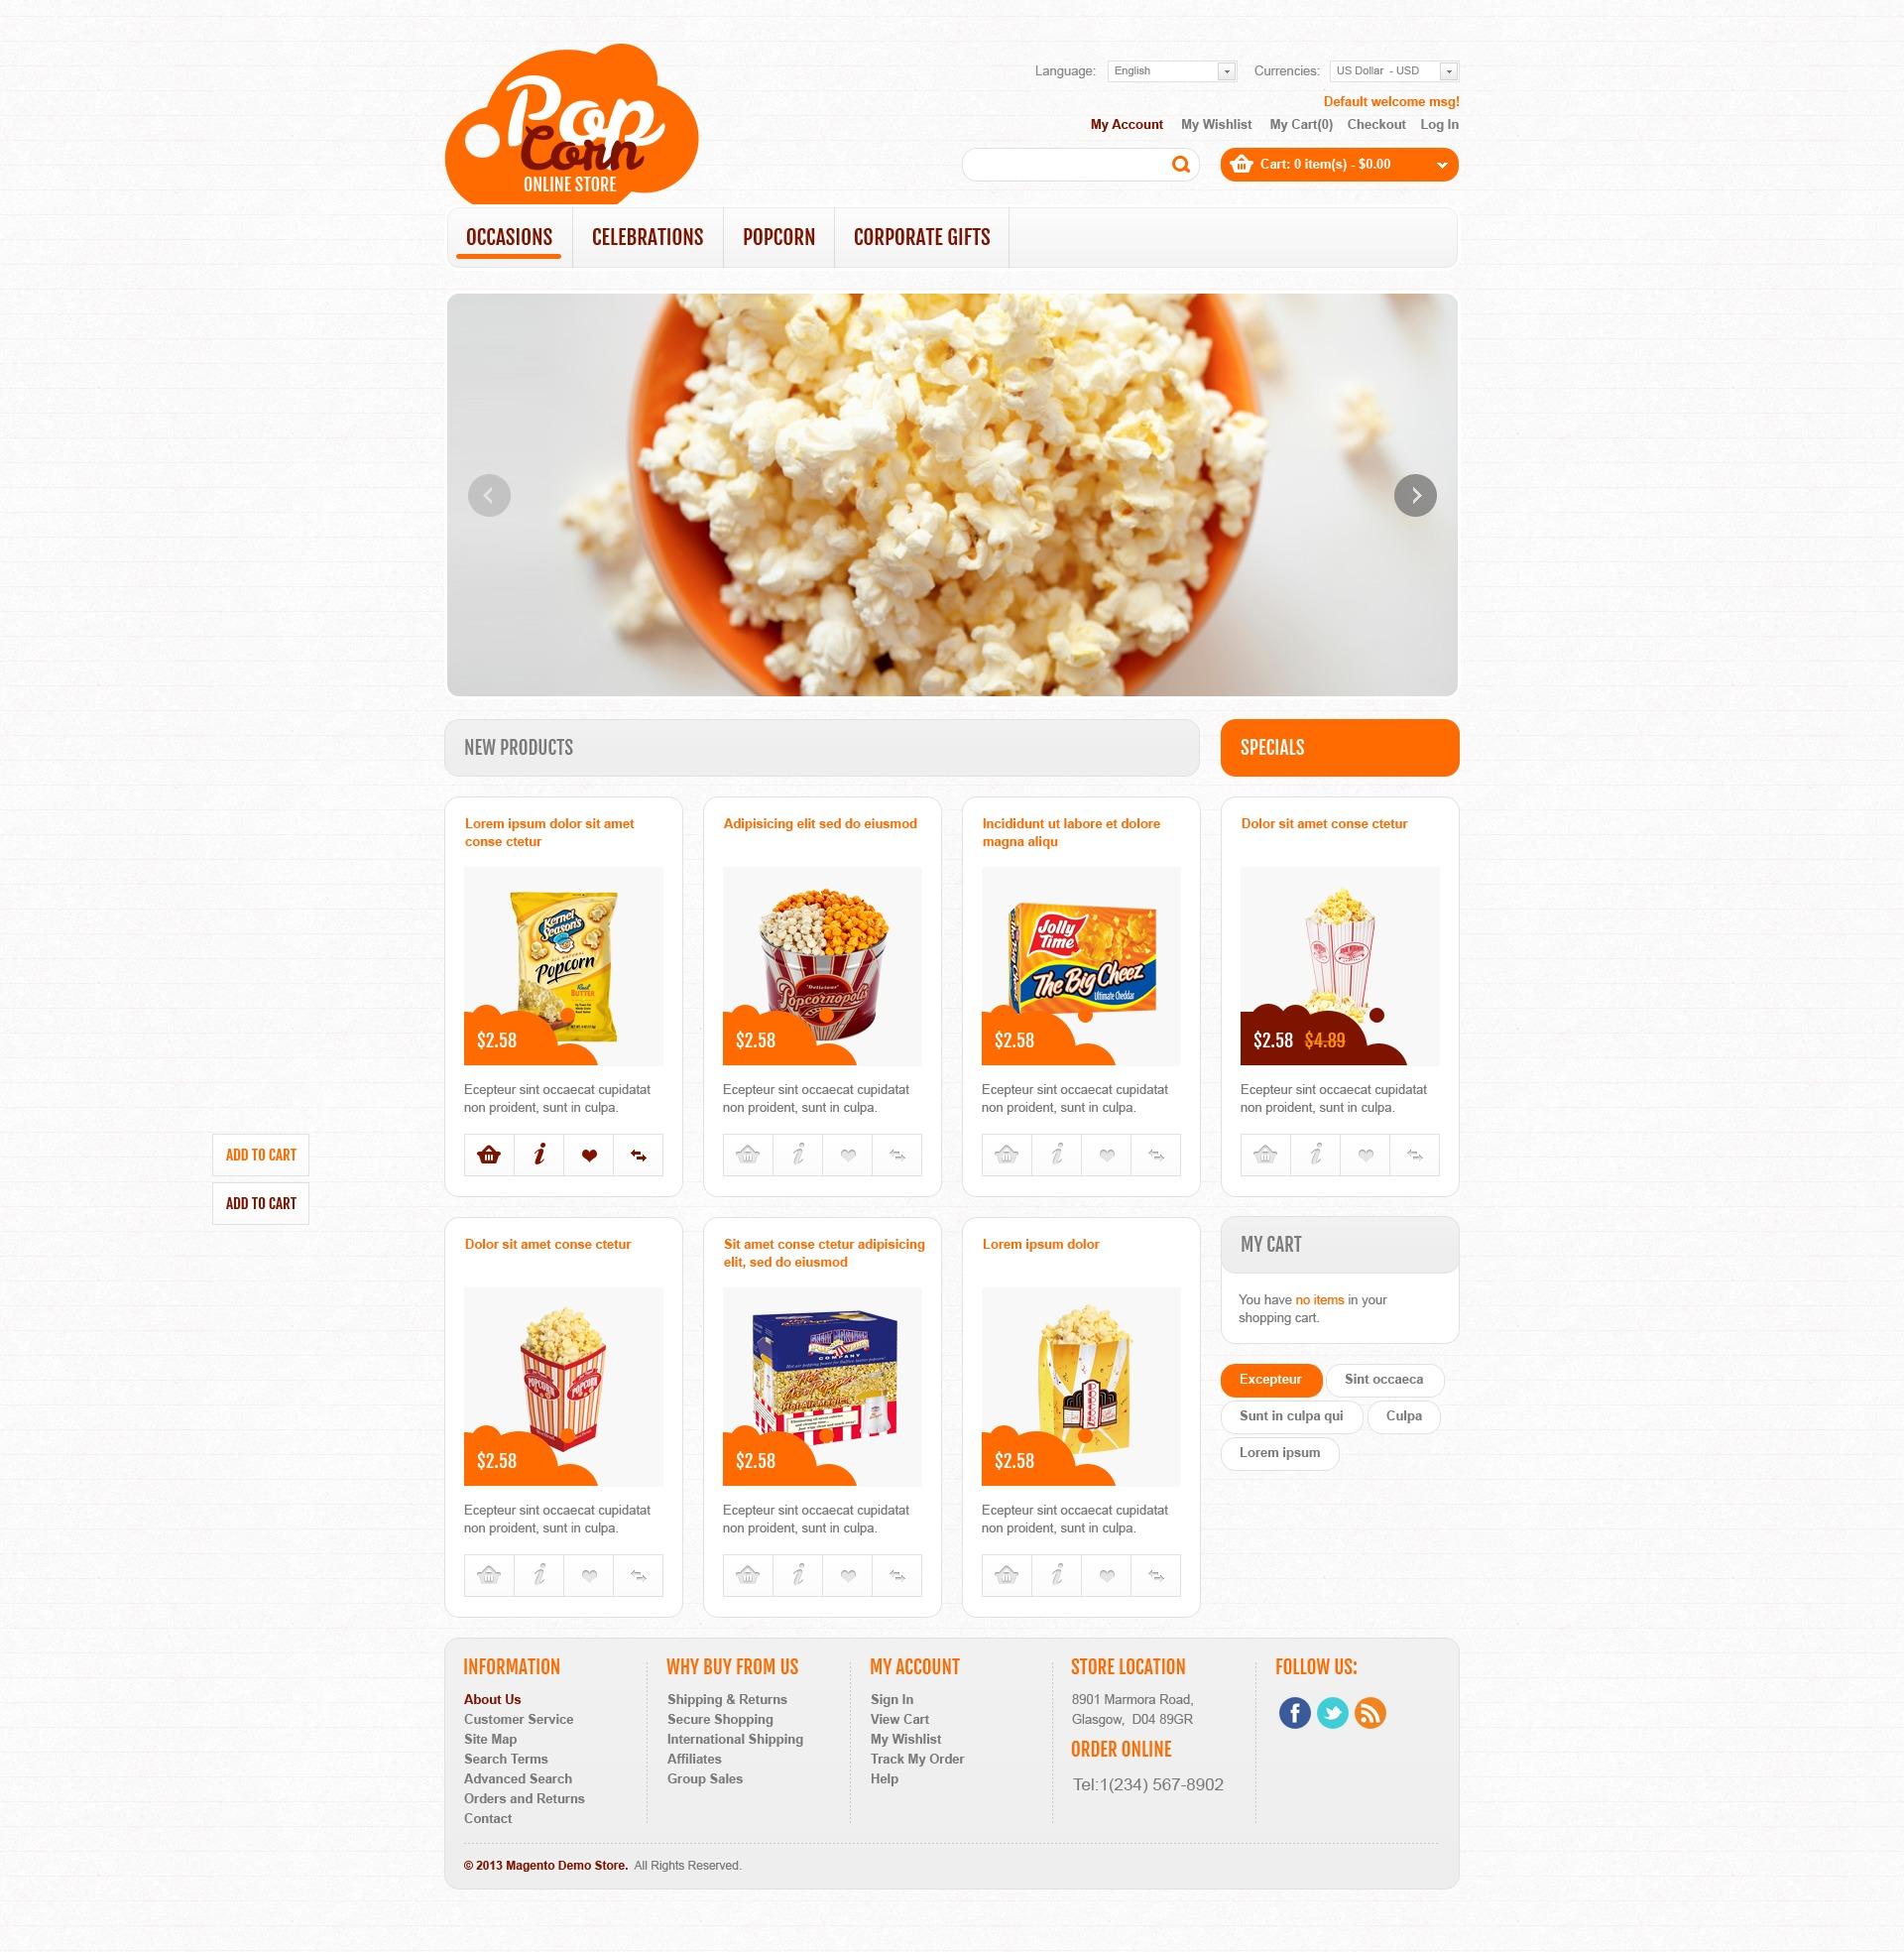 Szablon Magento Online Popcorn Store #44981 - zrzut ekranu